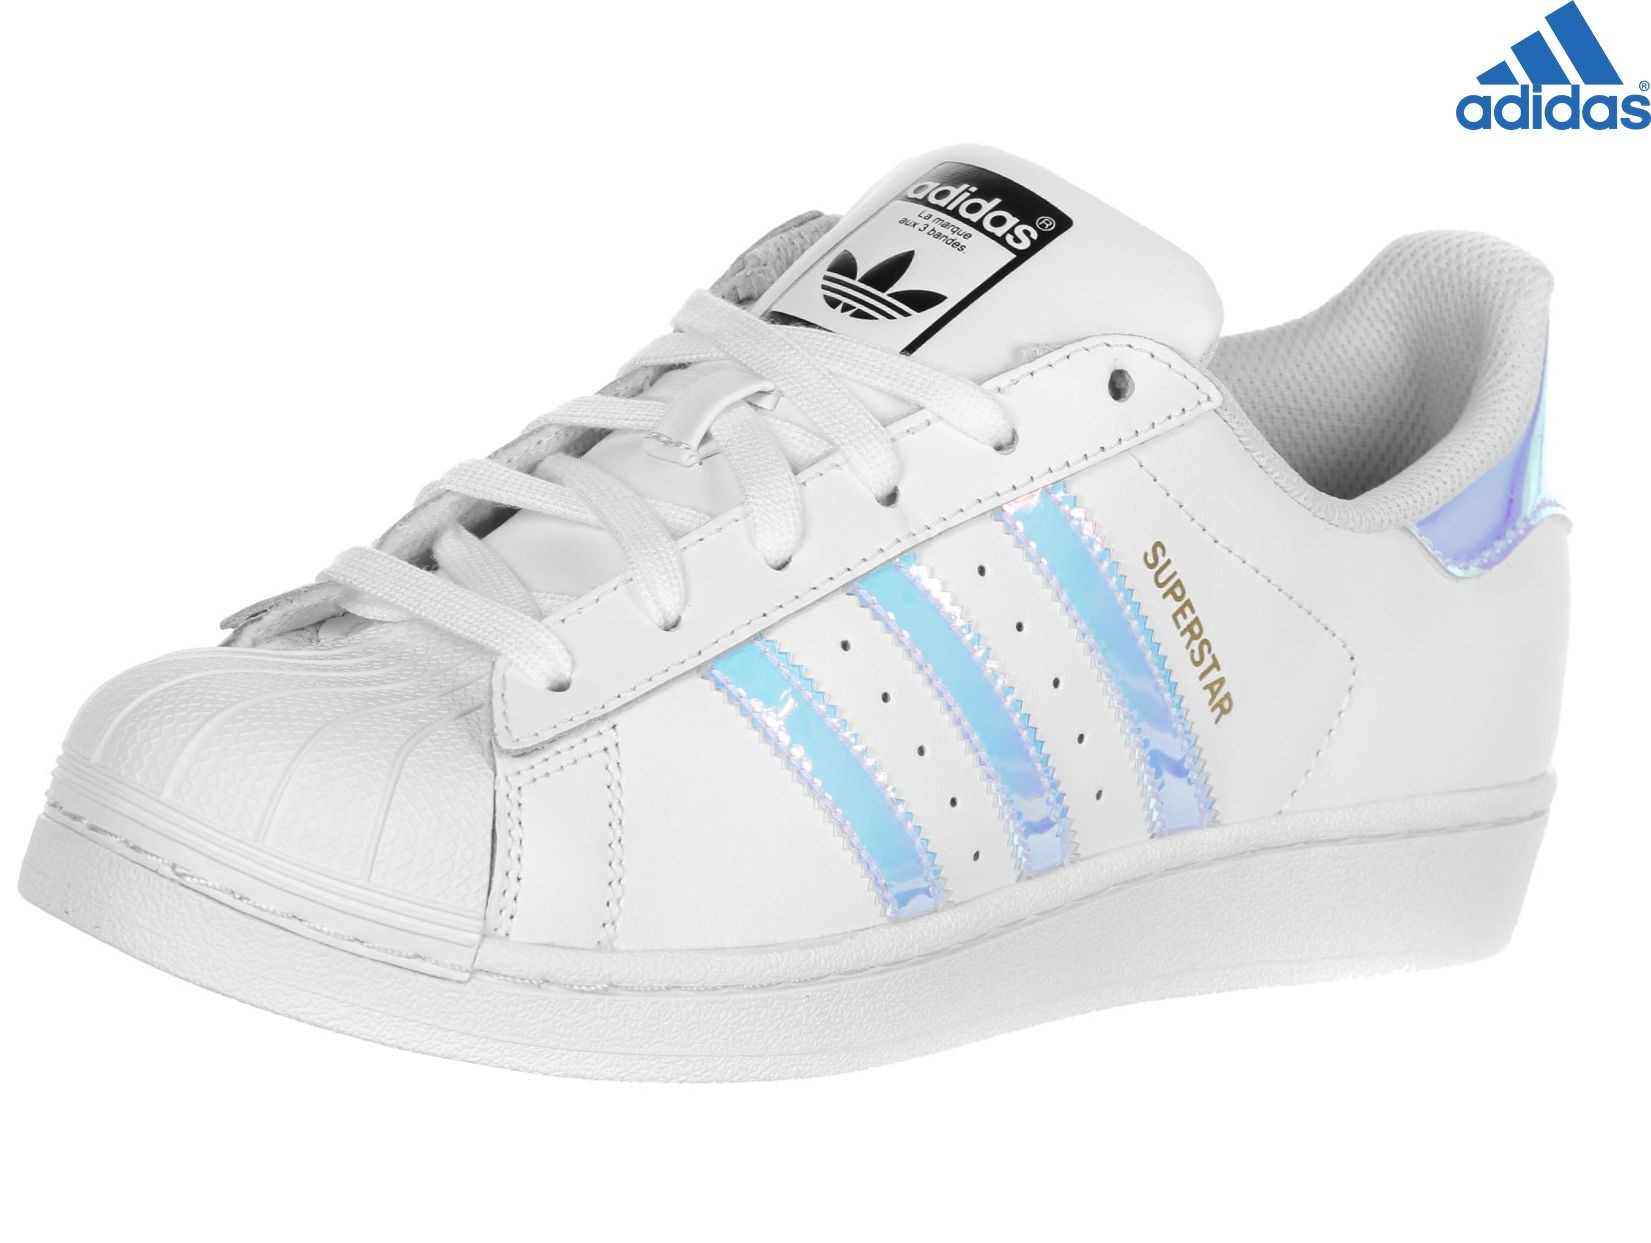 For 5hzqs1qf Basket Acheter Thereby Cher Adidas Courir Femme Pas zSVqUMp